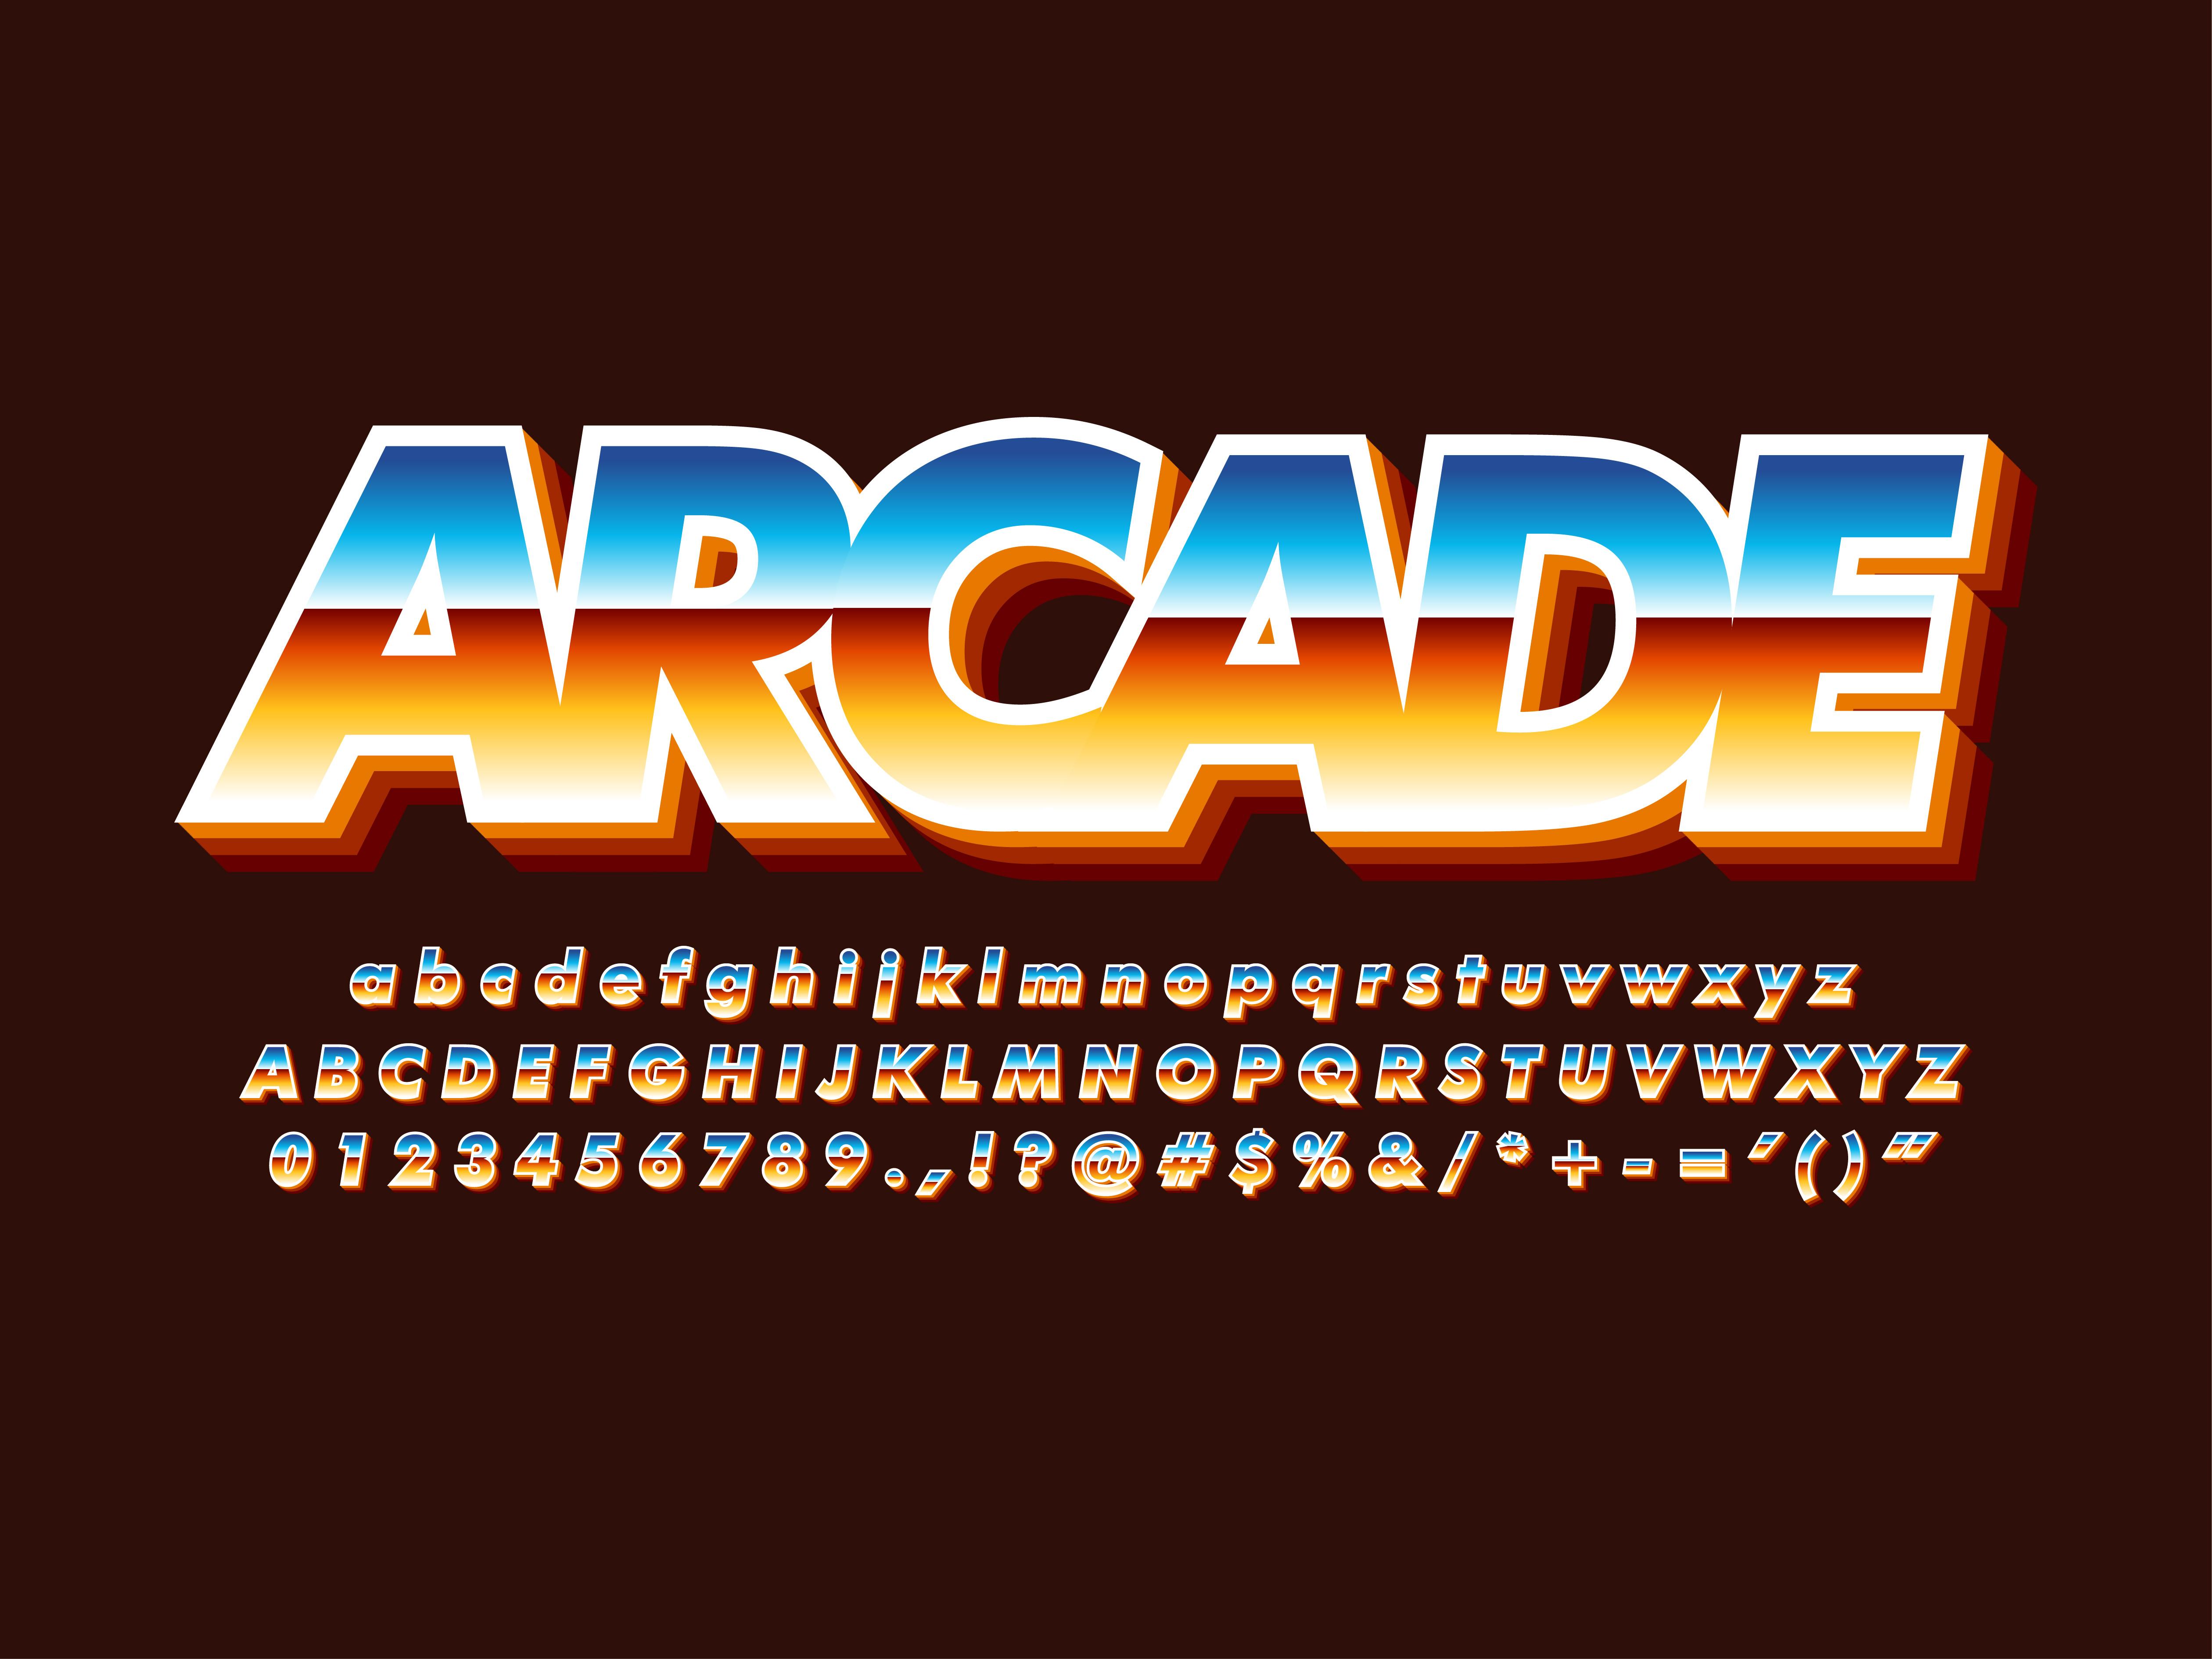 80s Retro Futurism Arcade Game Font - Download Free ...